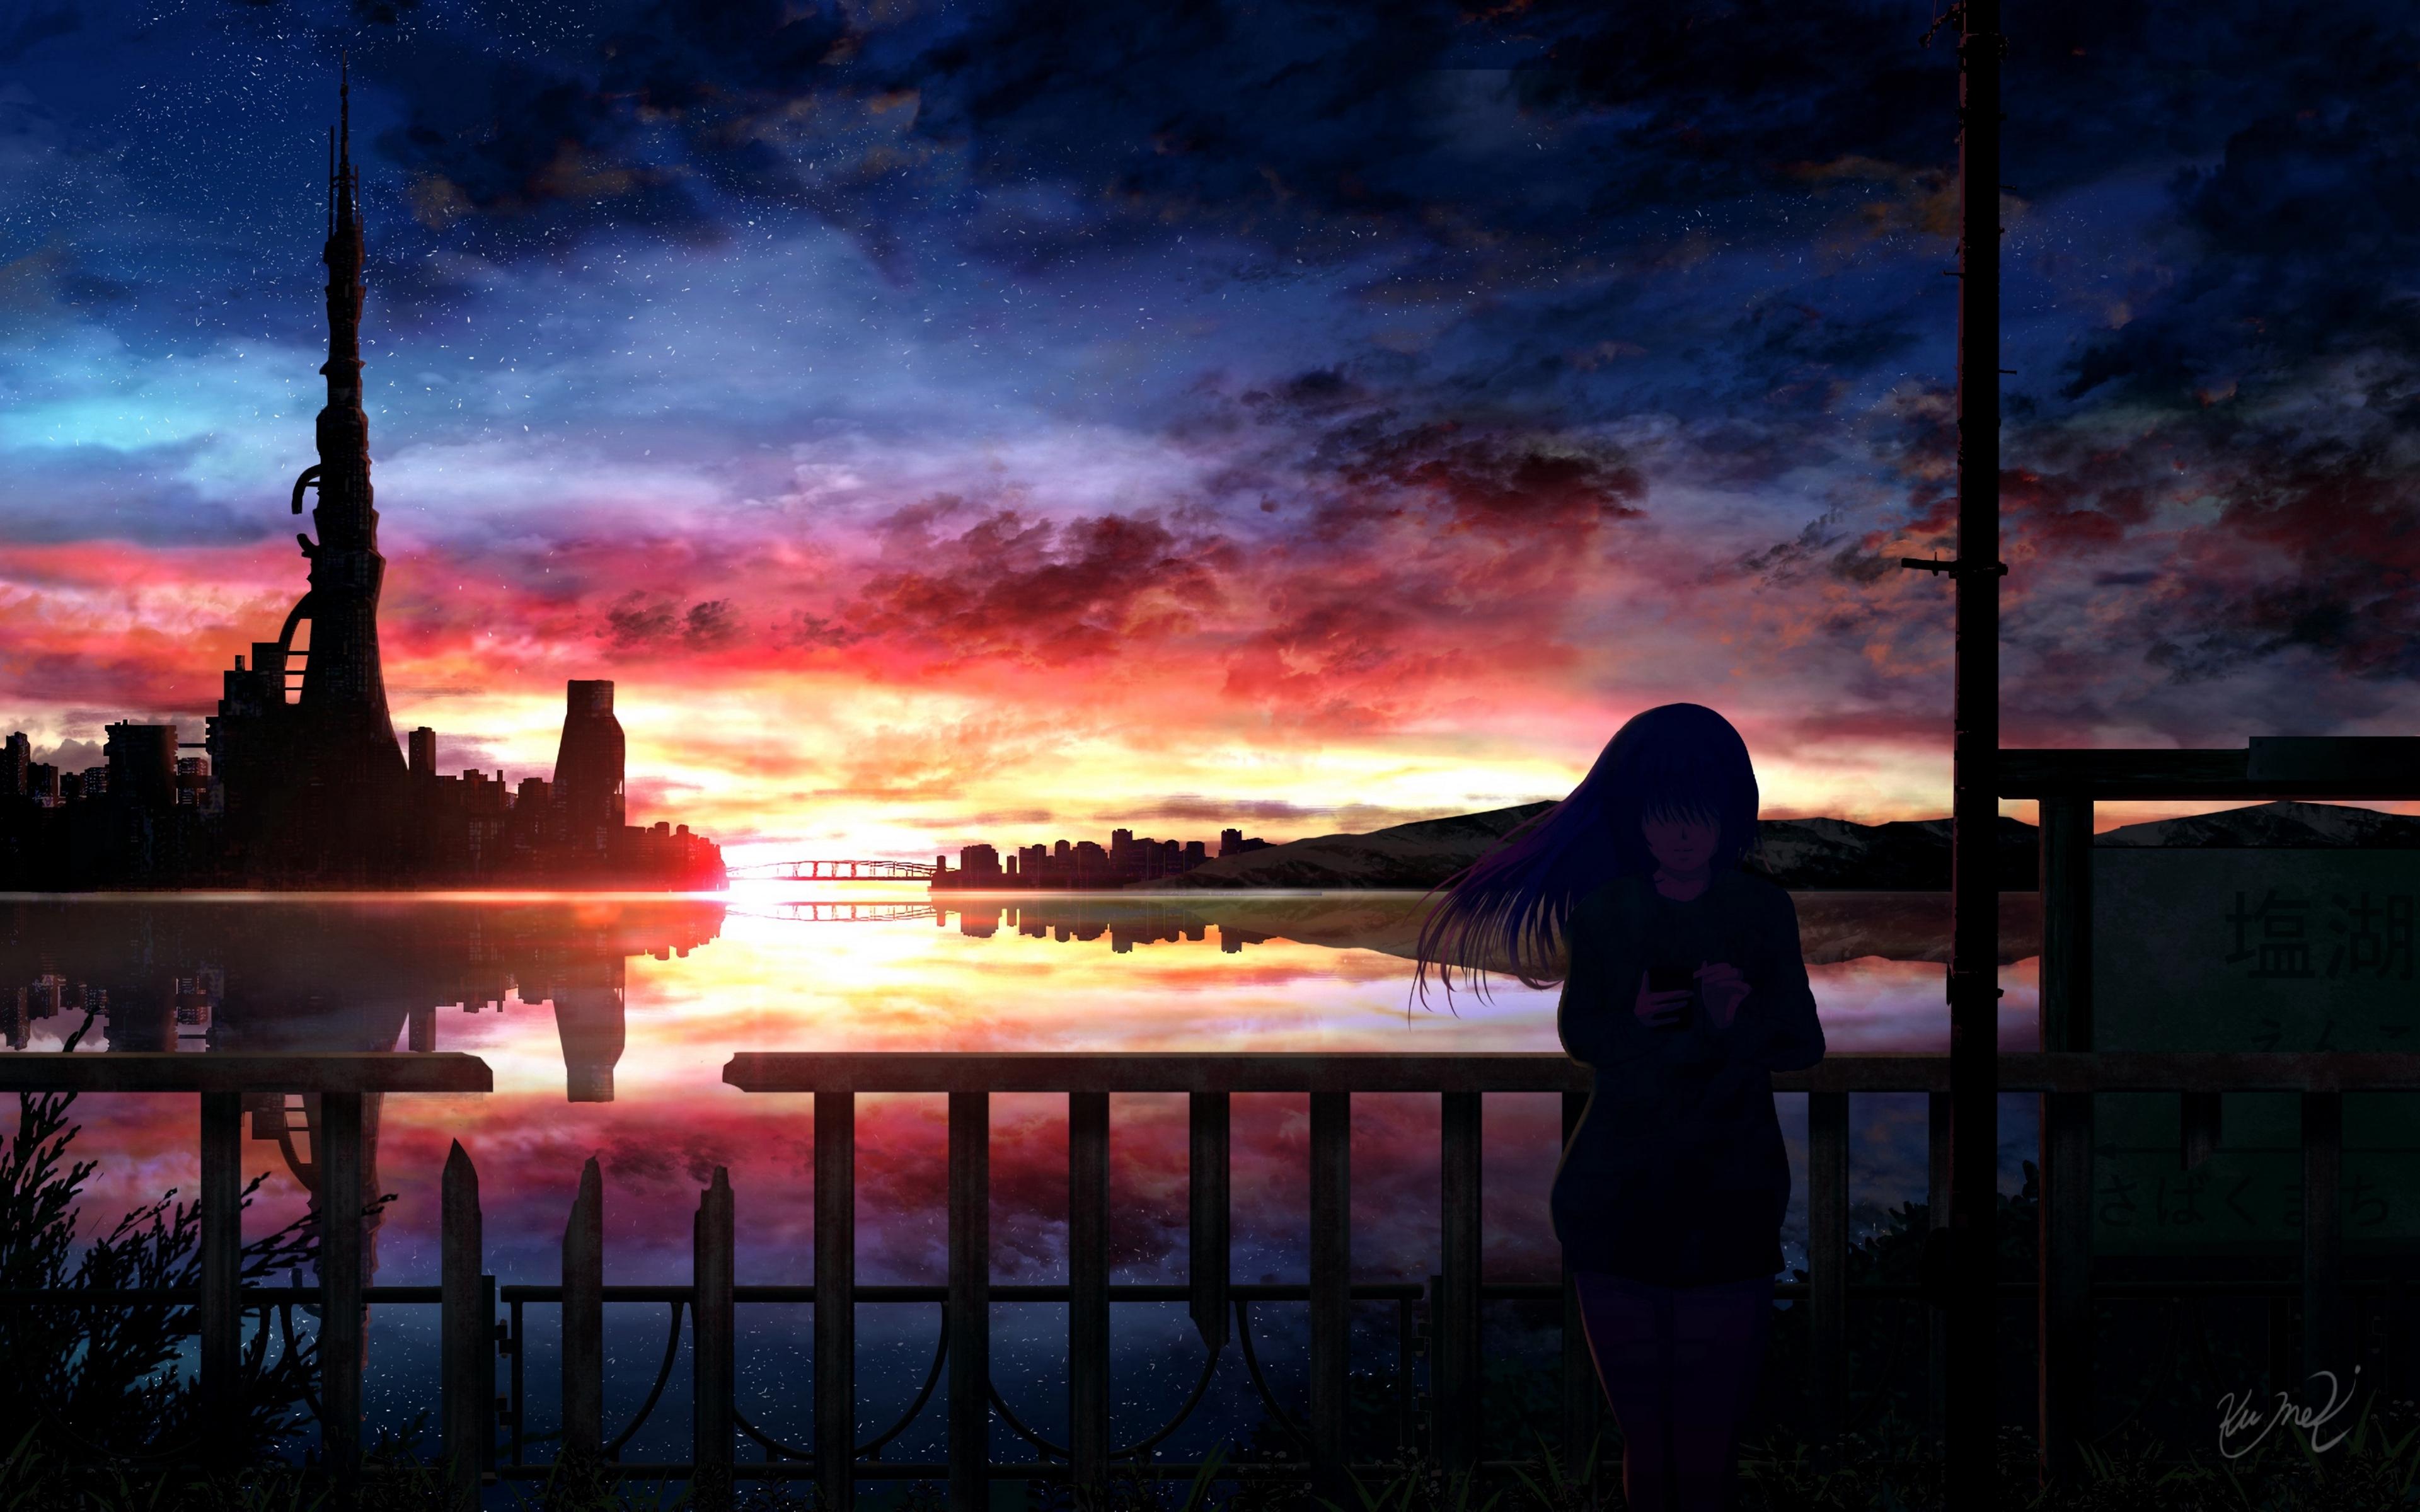 1366x768 Anime Girl In Sunset 1366x768 Resolution Wallpaper